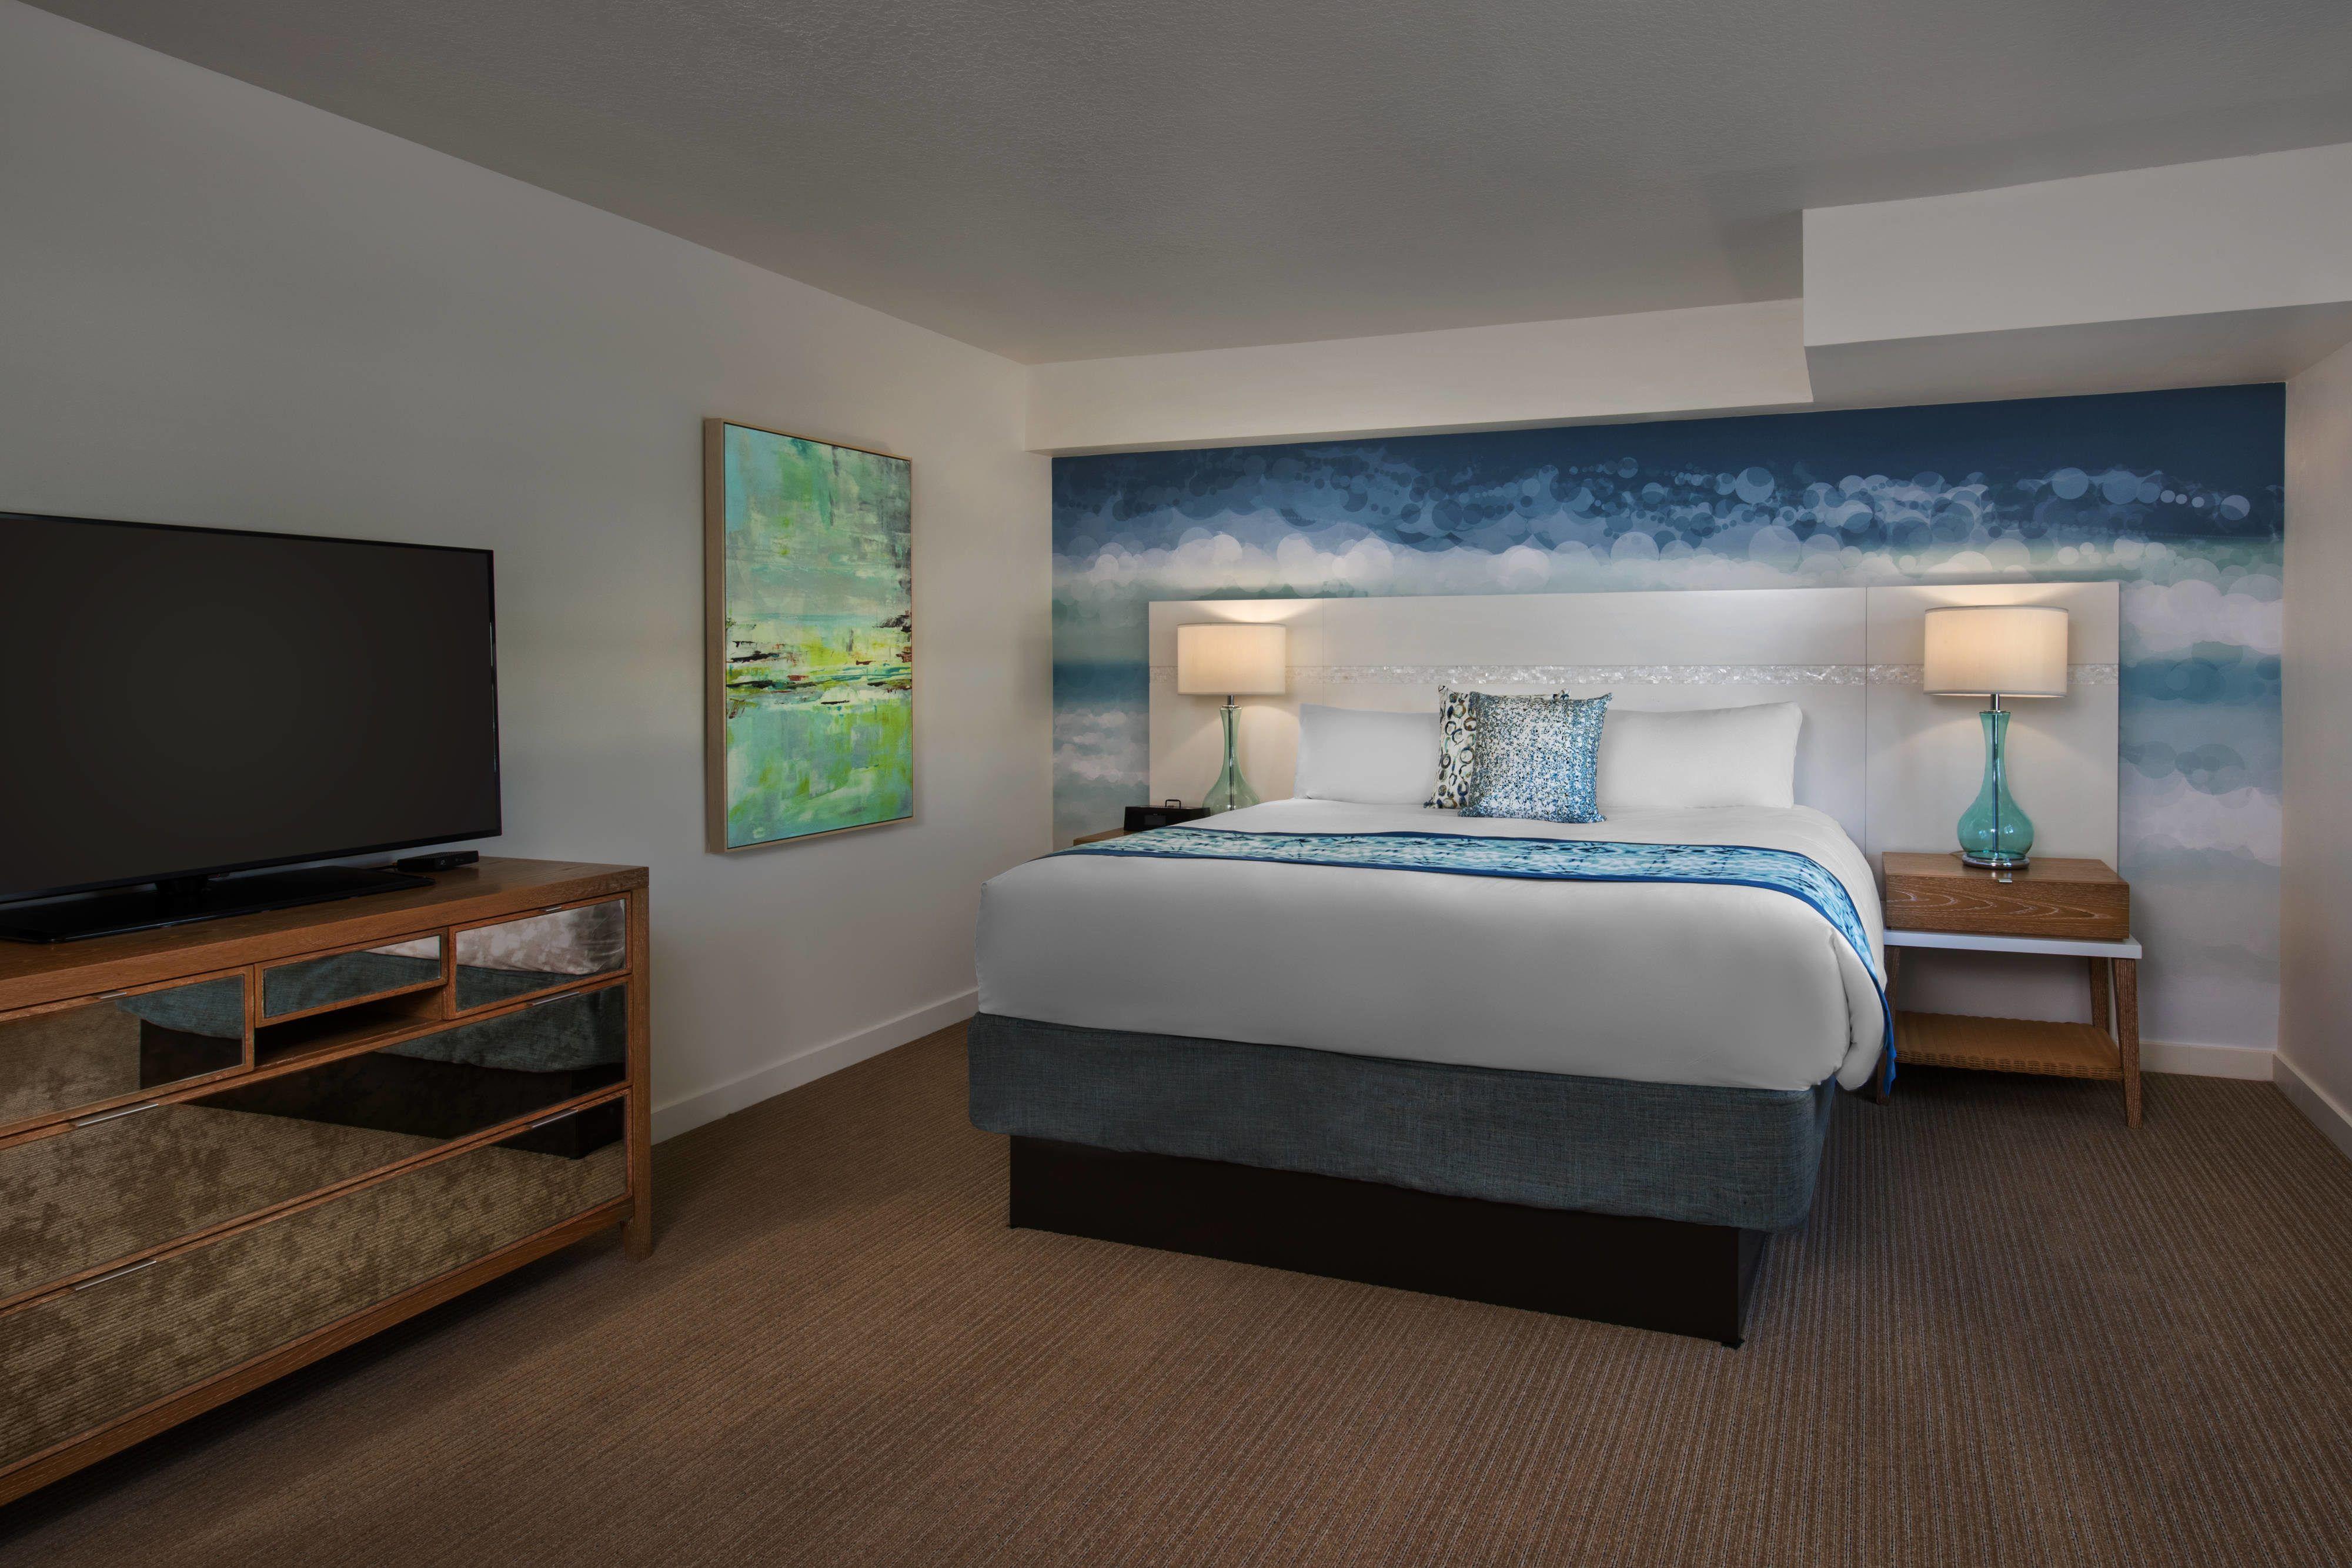 Marriott Vacation Club Pulse South Beach Two Bedroom Suite Master Bedroom Comfort Enjoy Comfort Marriott Vacation Club Vacation Club Two Bedroom Suites